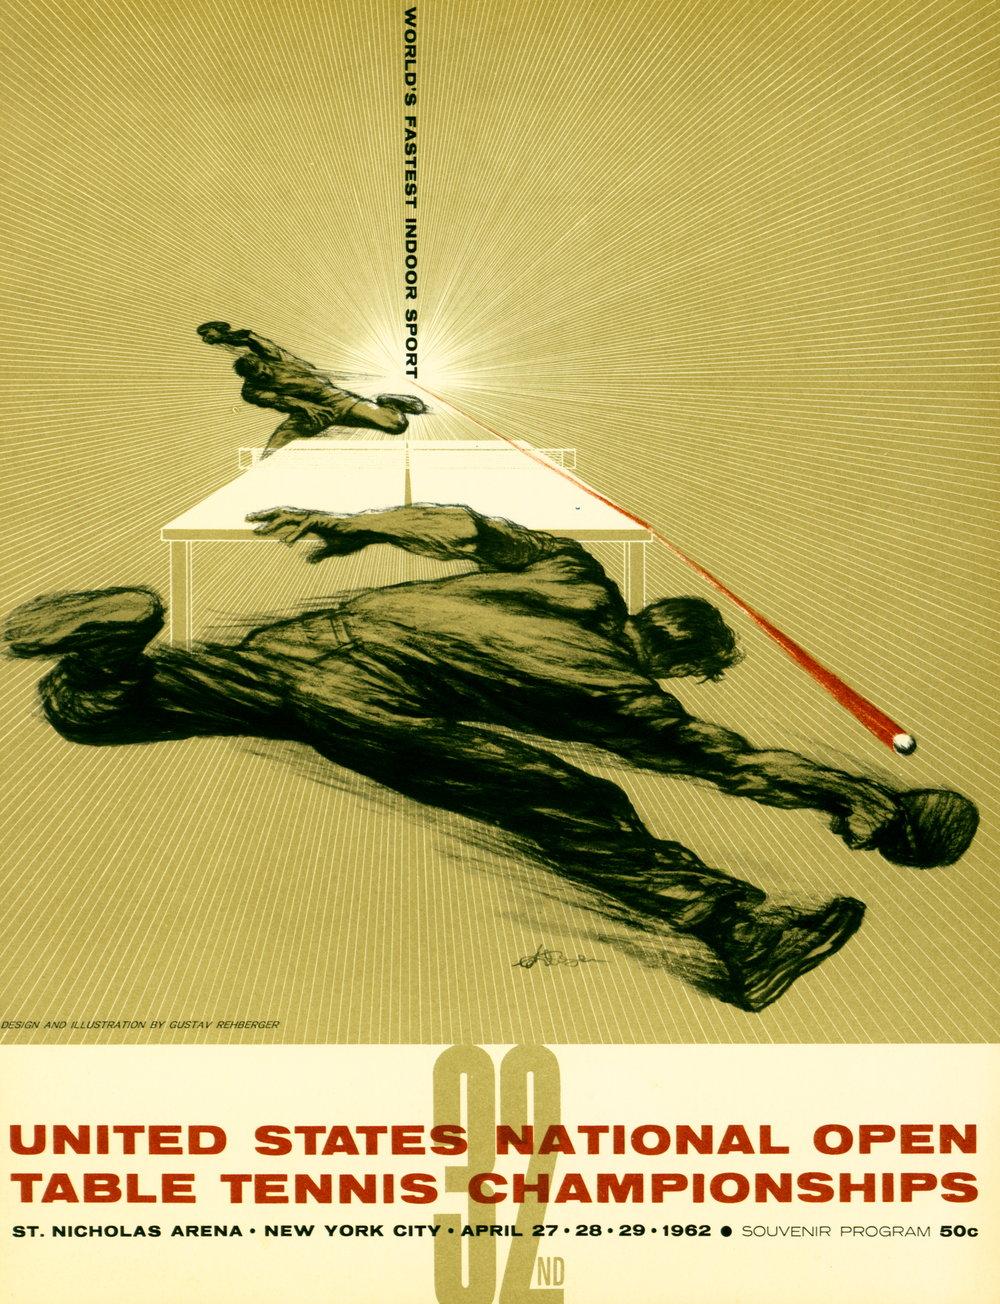 US NAT'L OPEN TABLE TENNIS CHAMPIONSHIPS   April 1962.JPG